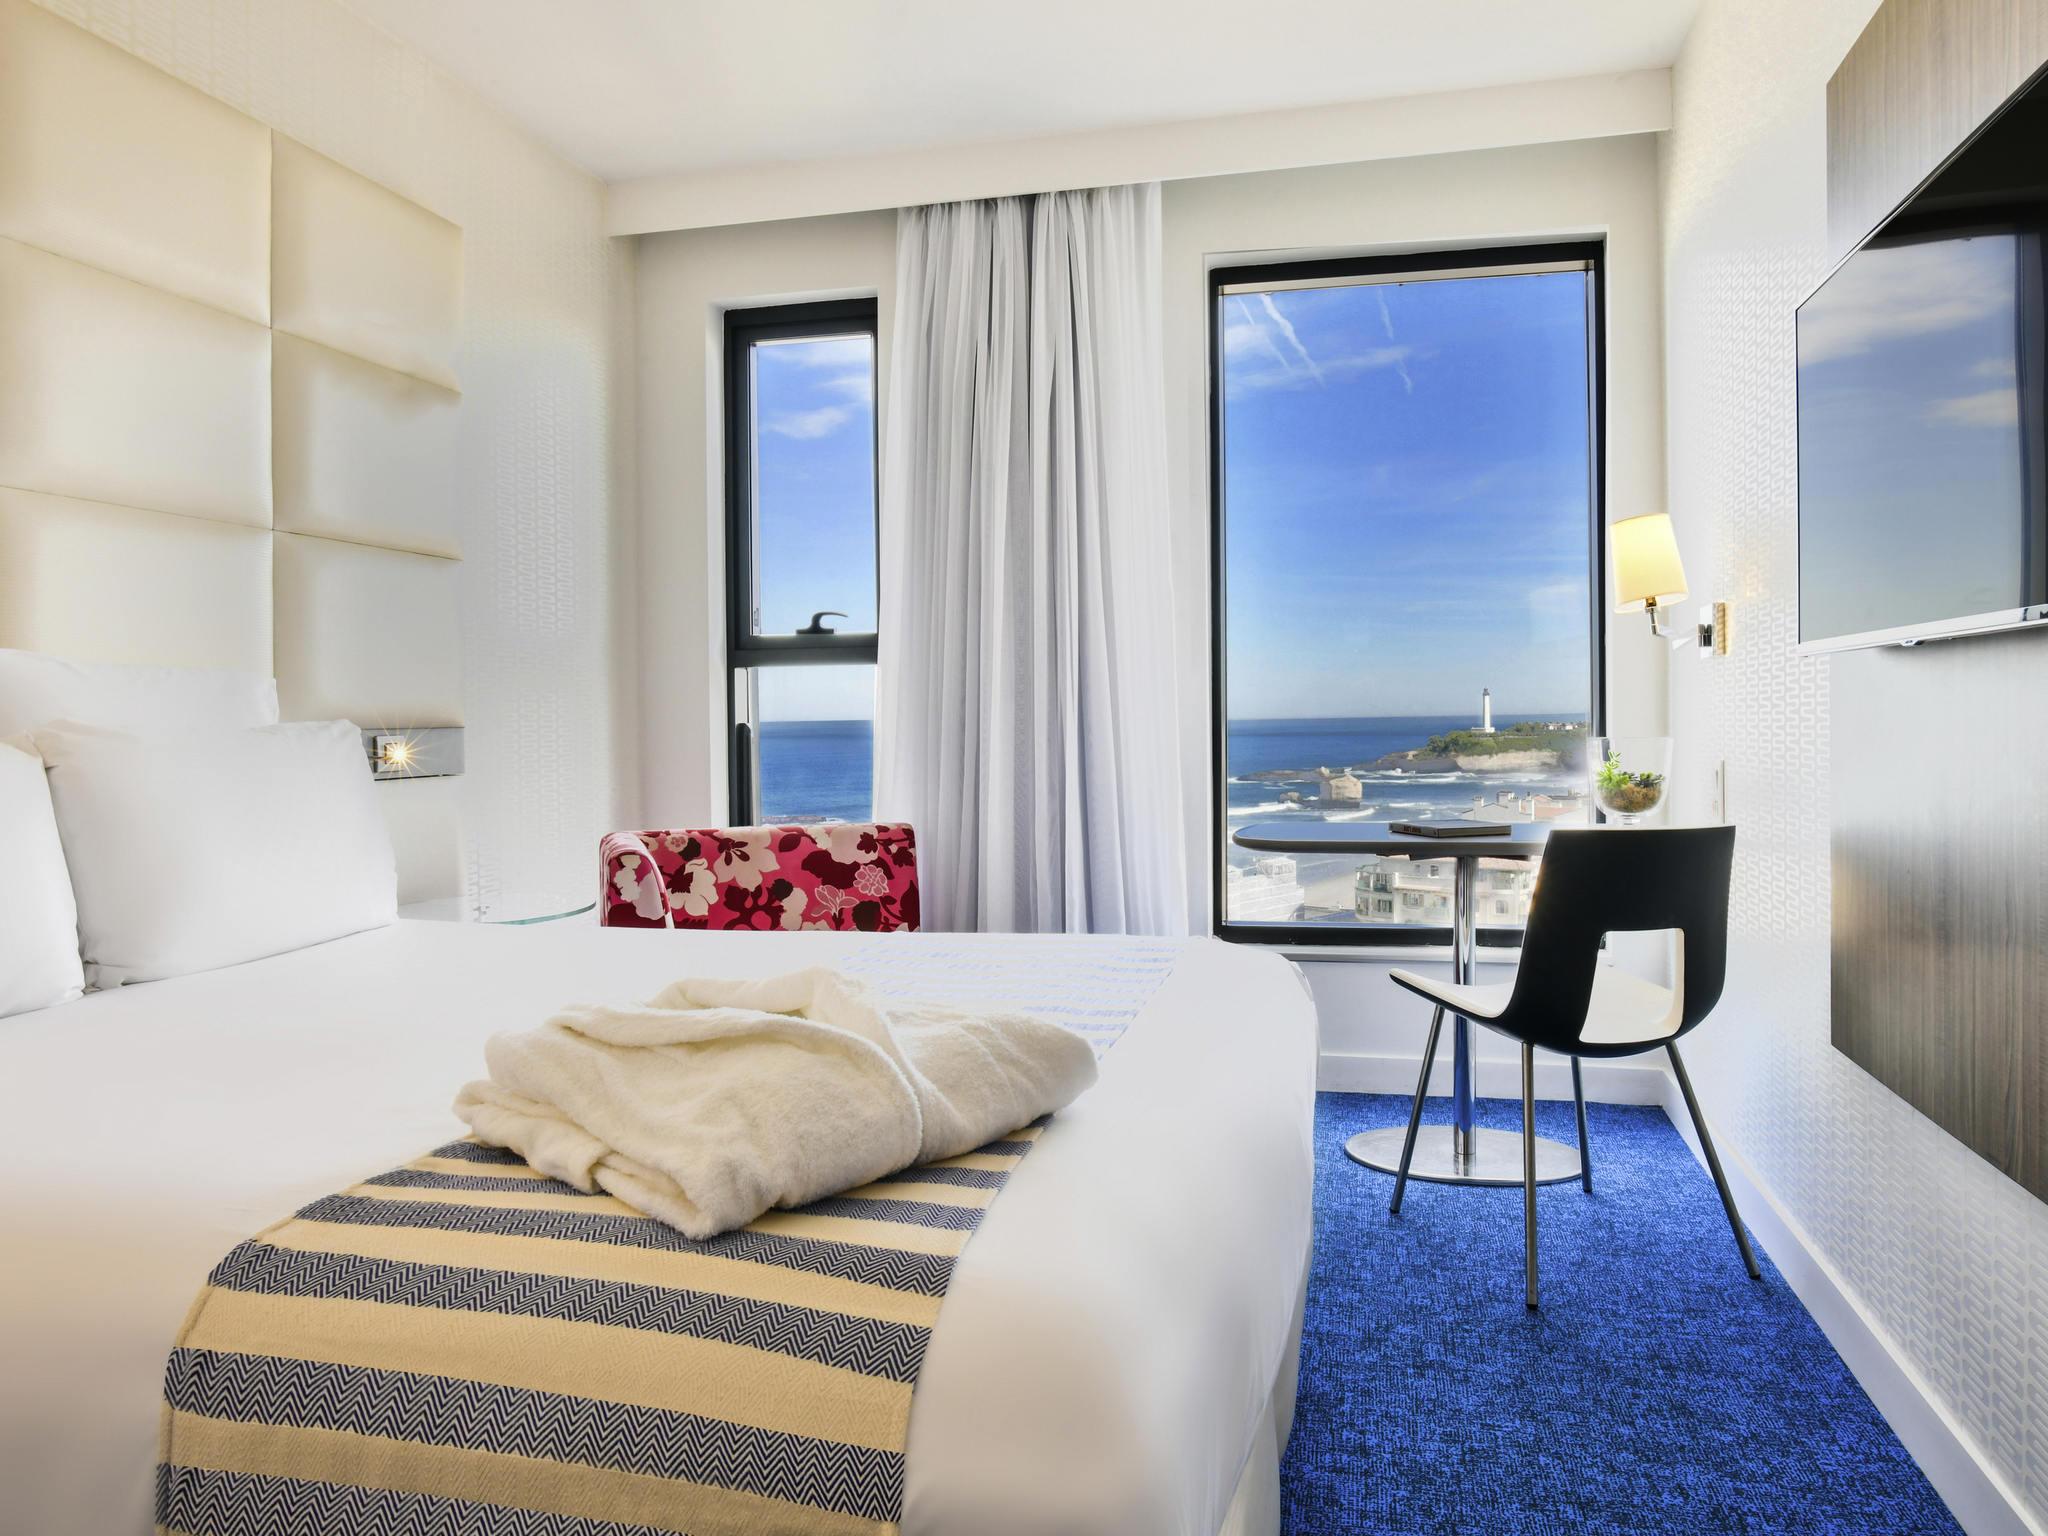 Hotel – Hotel Mercure Le President Biarritz Centro